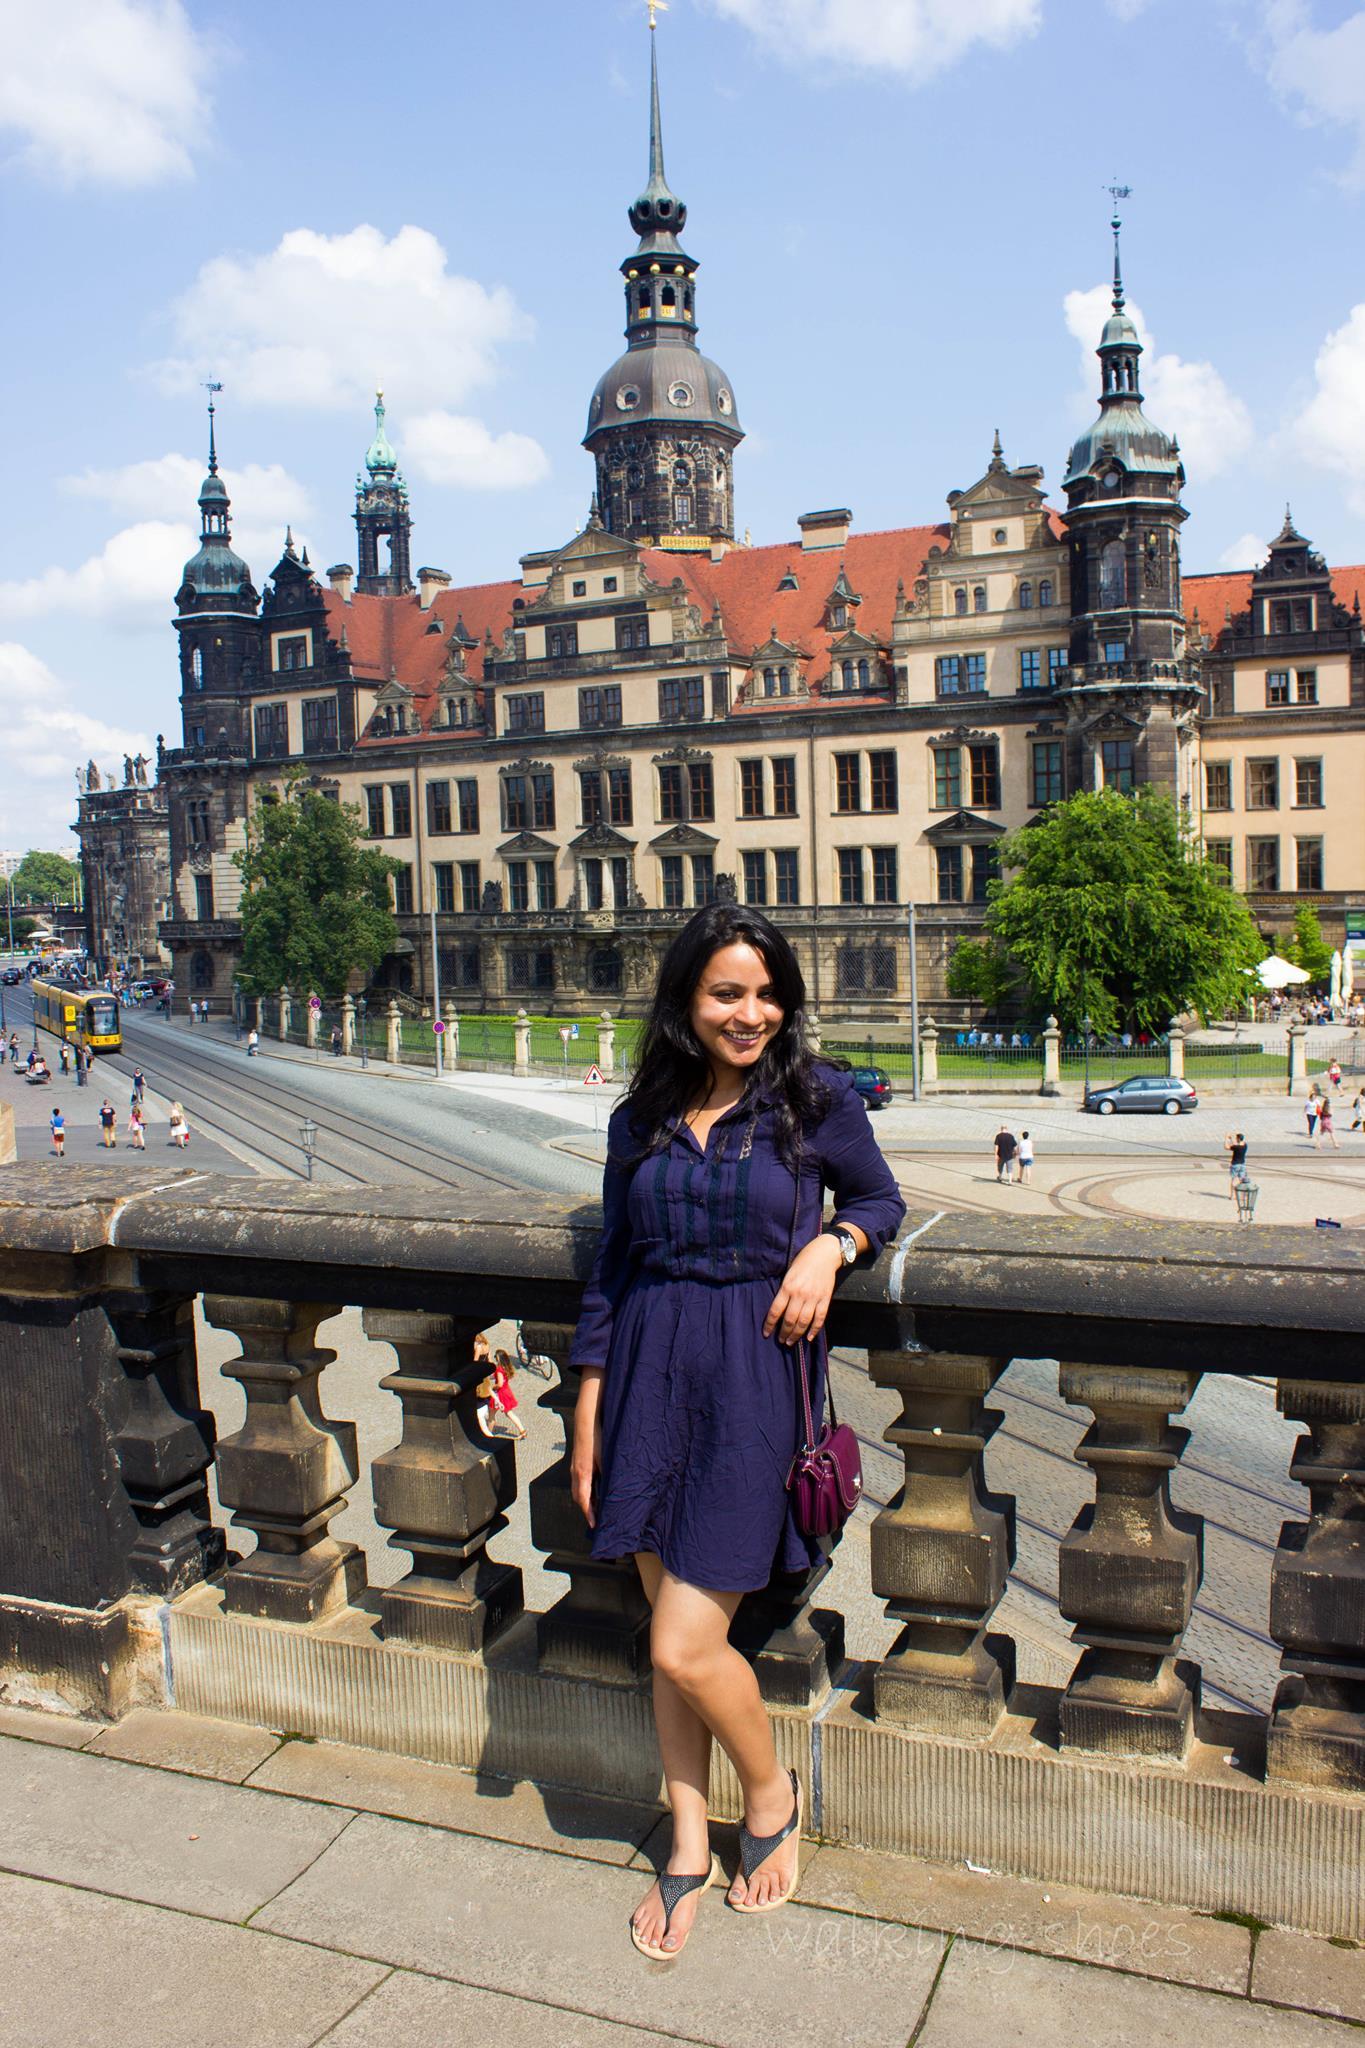 Dresden New York Times Travel